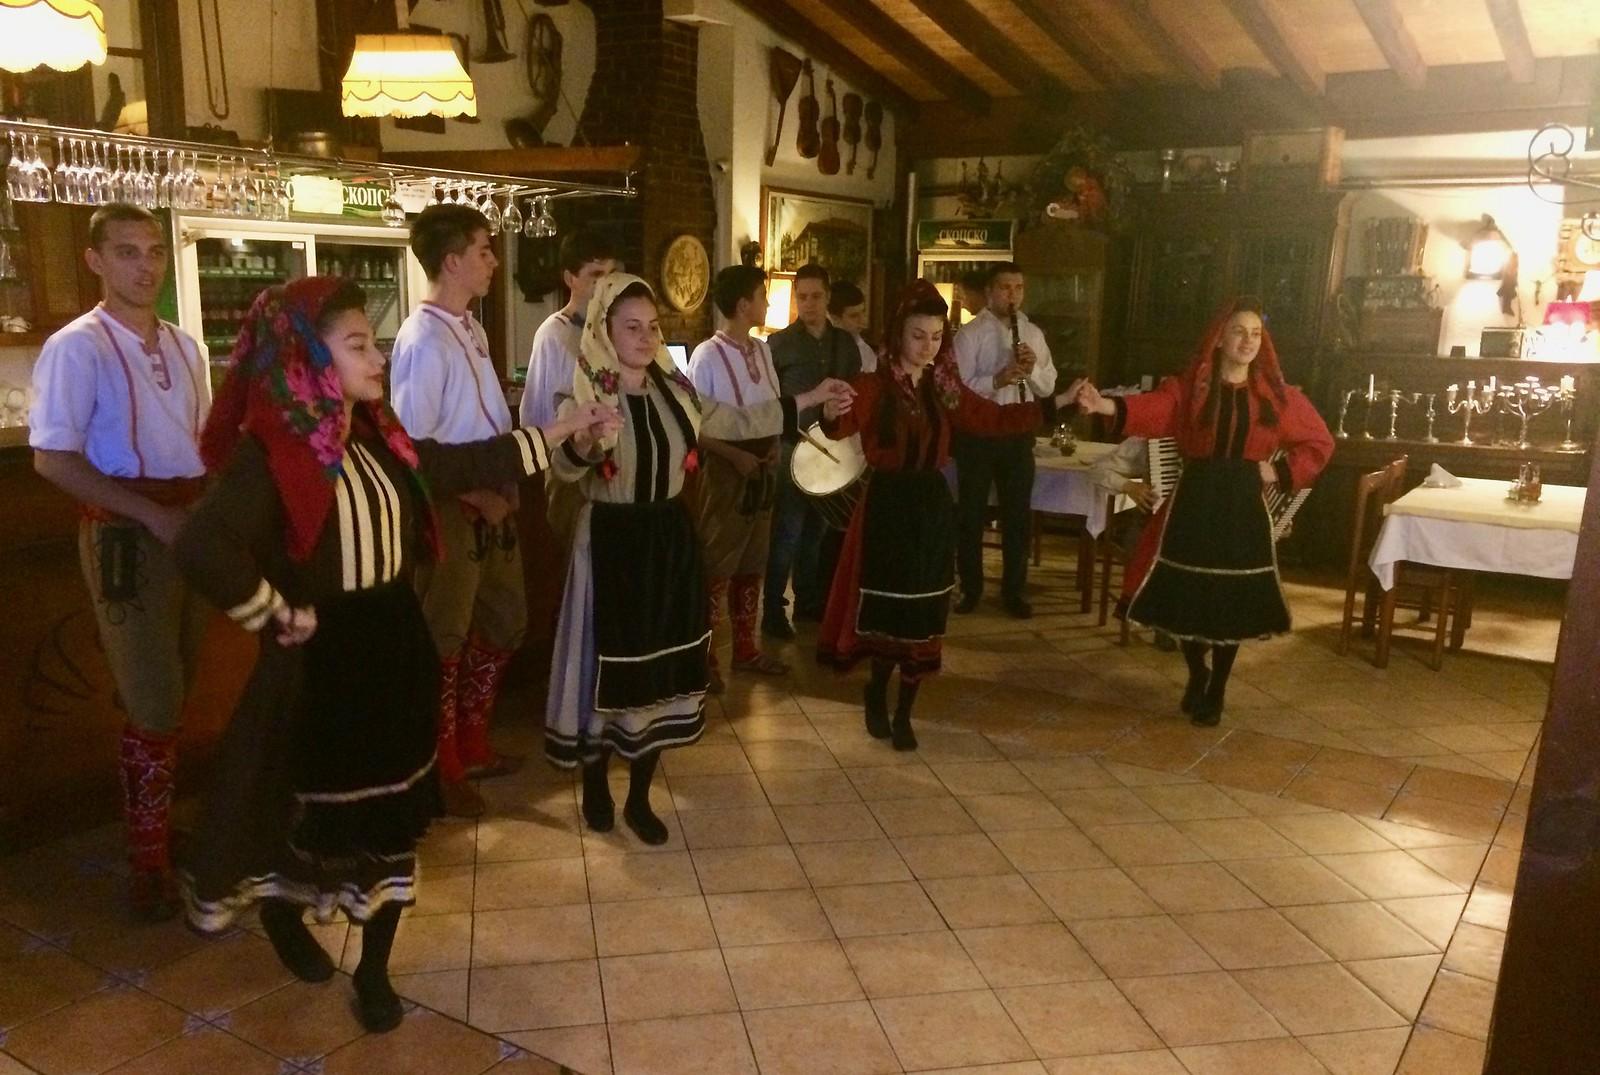 201705 - Balkans - Folk Dancing - Ohrid, Ohrid - Ulica Kuzman Josifovski Pitu, May 28, 2017